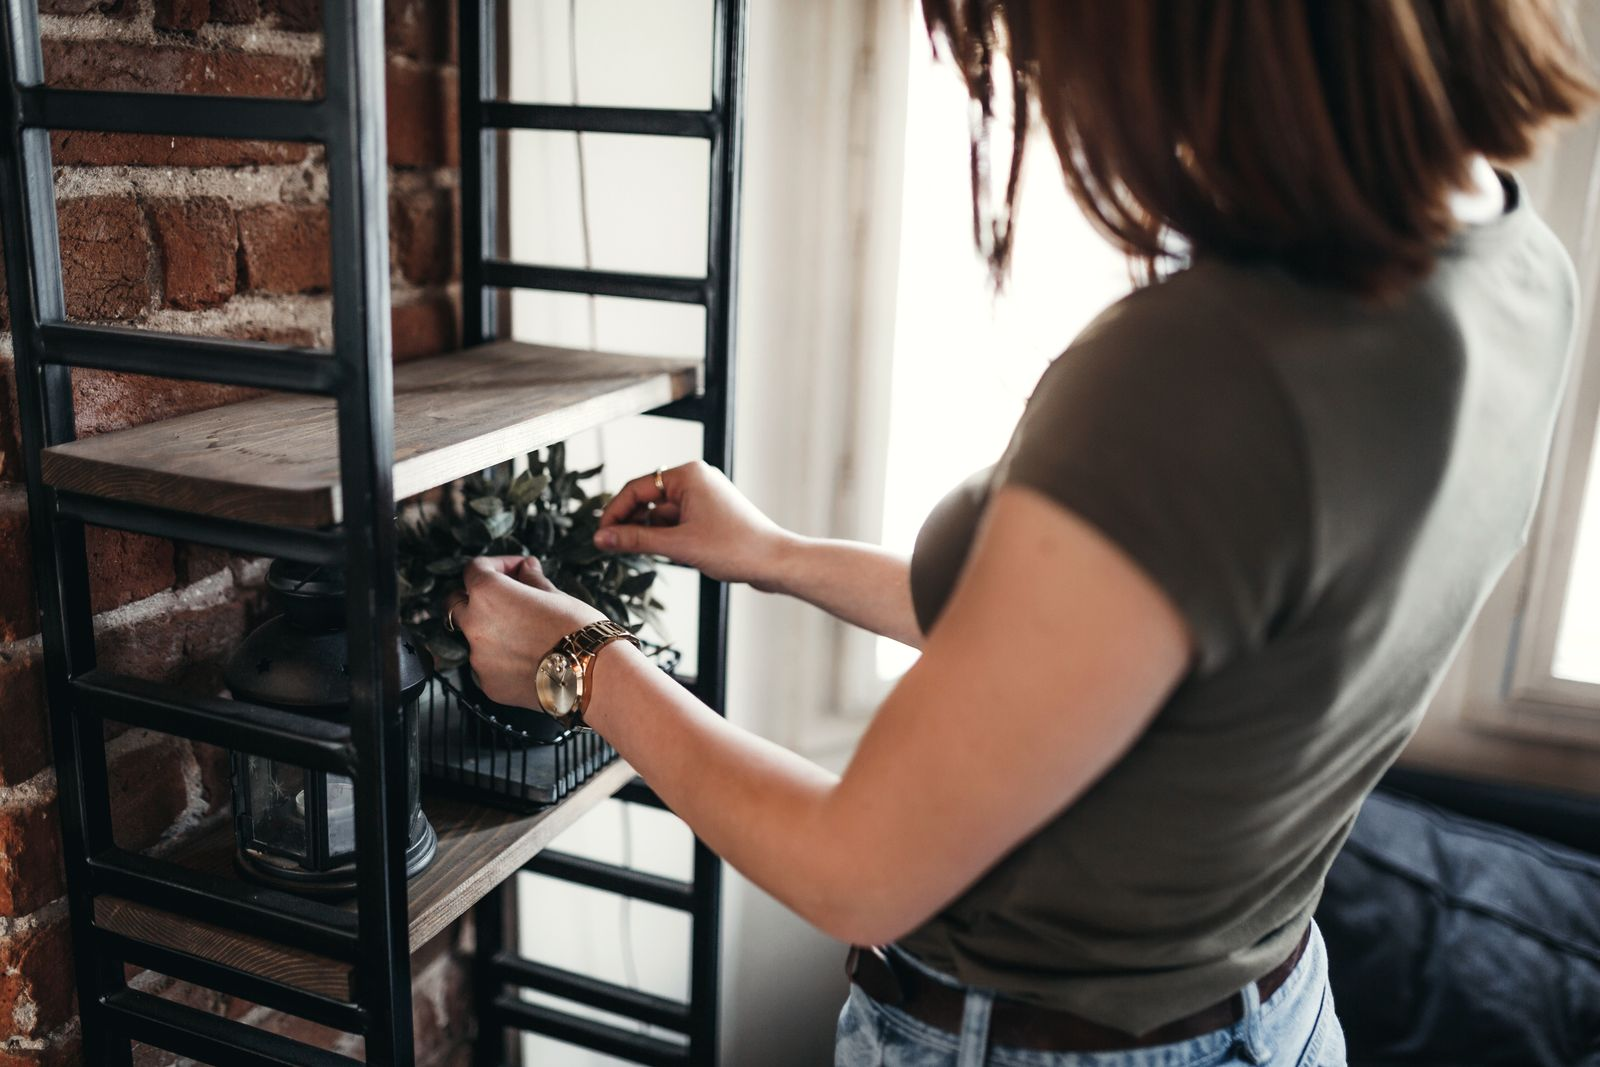 Woman placing a plant on a shelf